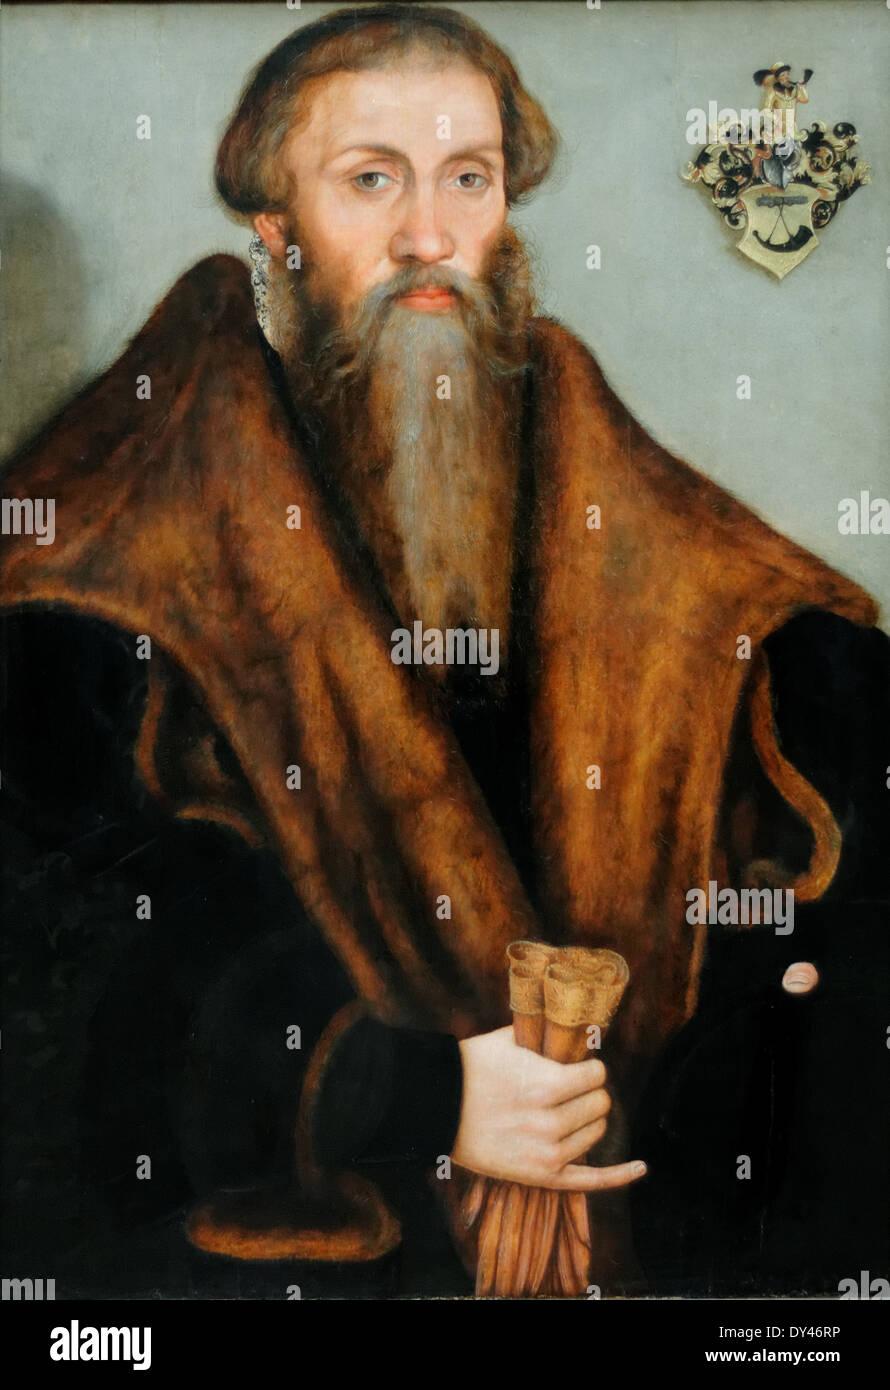 Lucas Cranach - The Jurist Leonhard Badehorn - XVI th Century - German School - Gemäldegalerie - Berlin - Stock Image